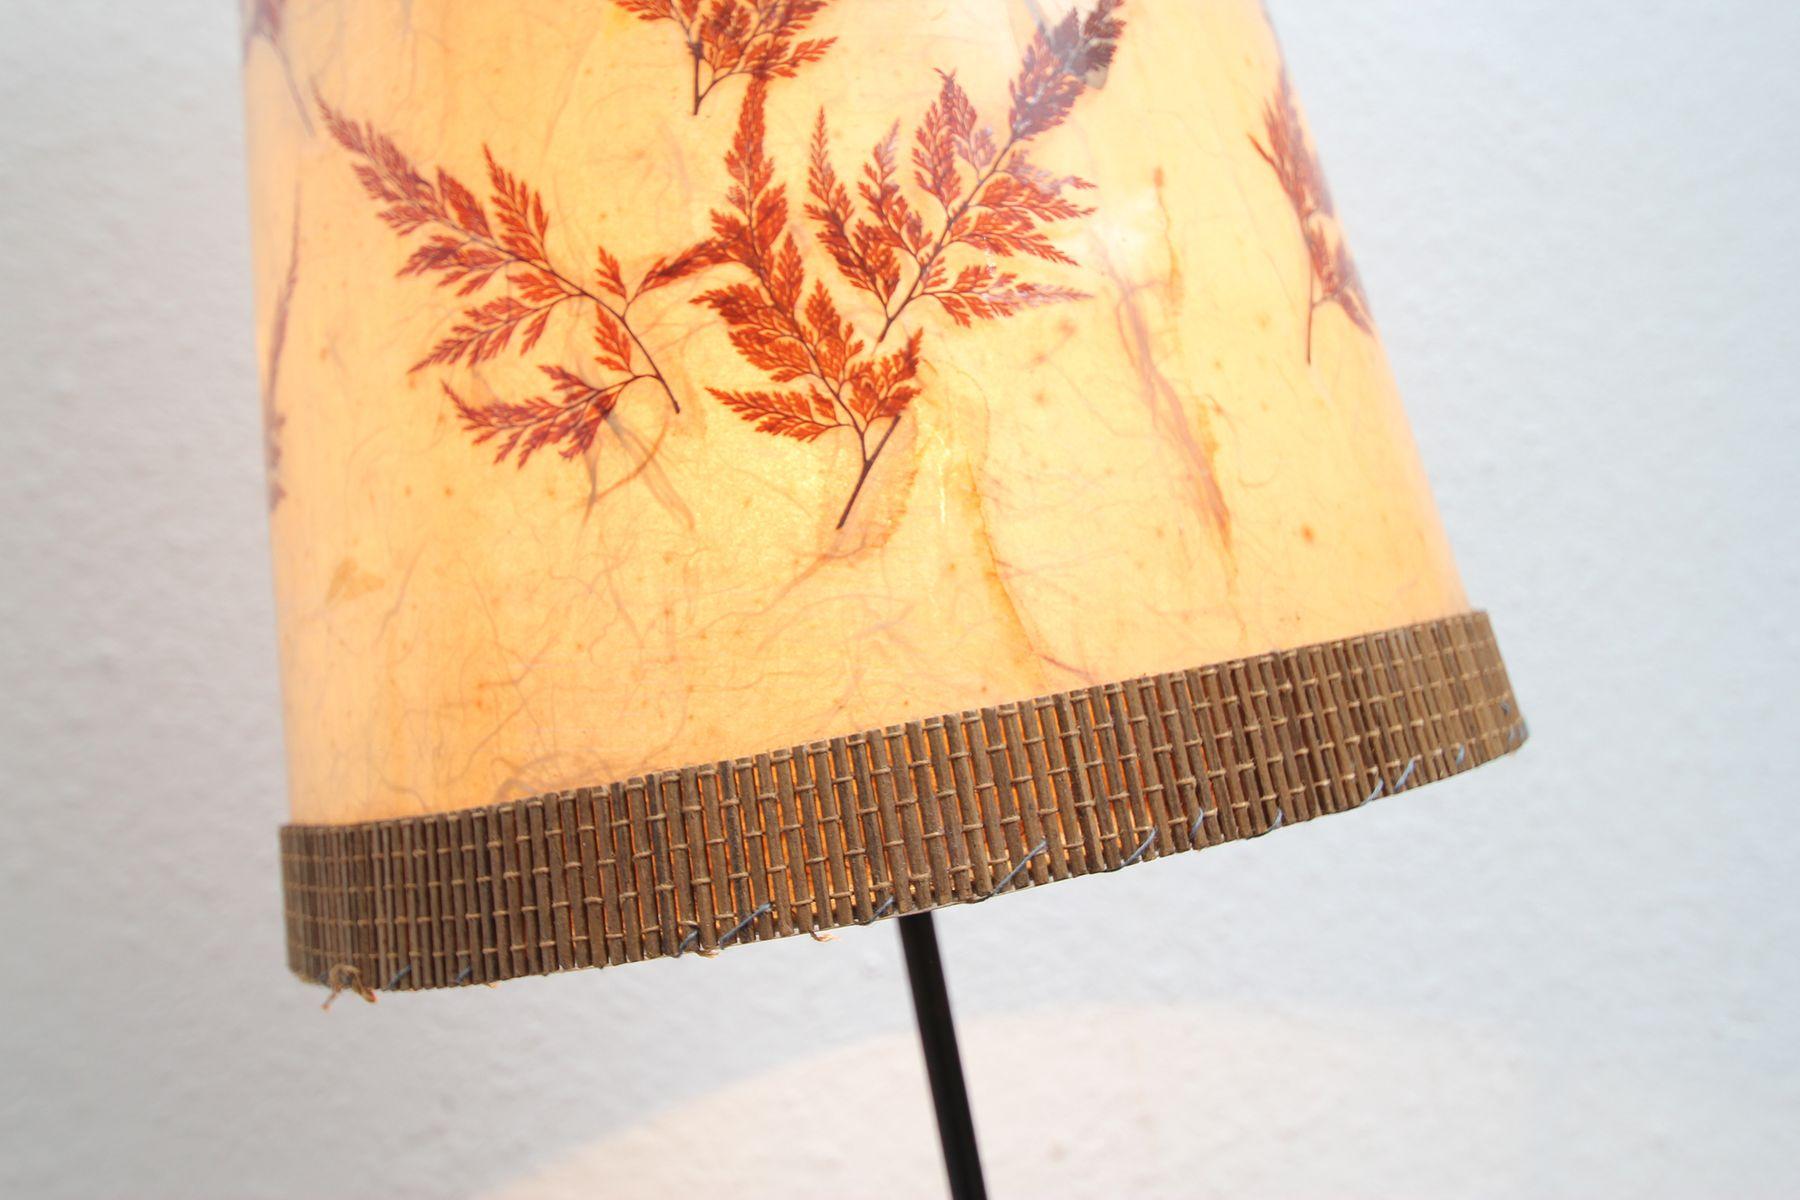 German Teak Tripod Lamp, 1950s for sale at Pamono